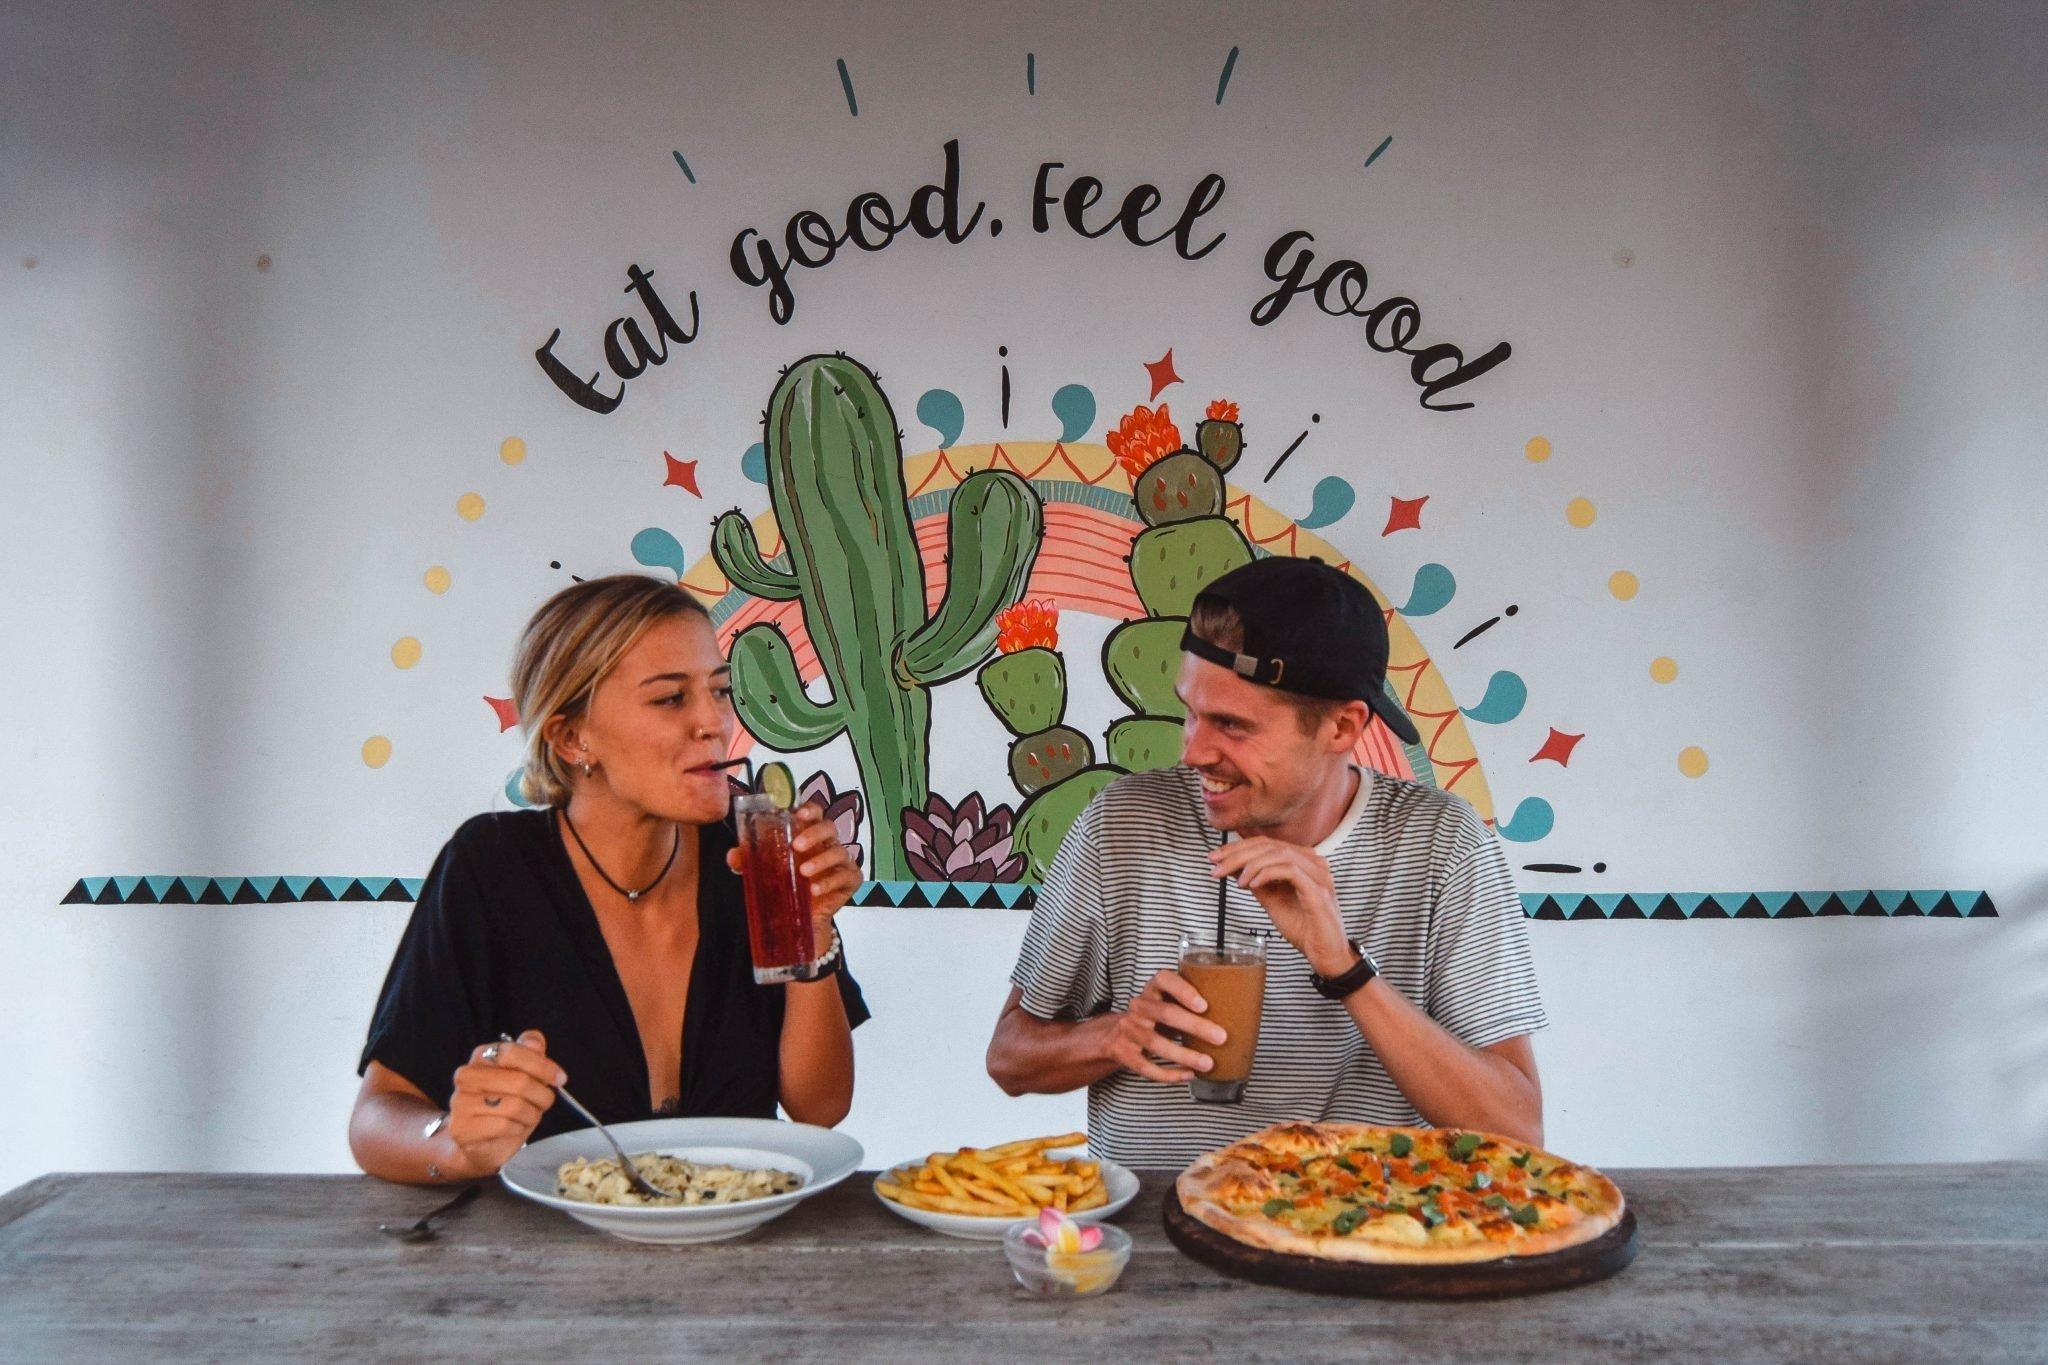 Wanderers & Warriors - Charlie & Lauren UK Travel Couple - Garden Canggu By Pizza House Restaurant Canggu Bali - Best Restaurants In Bali Food - Best Restaurants In Canggu